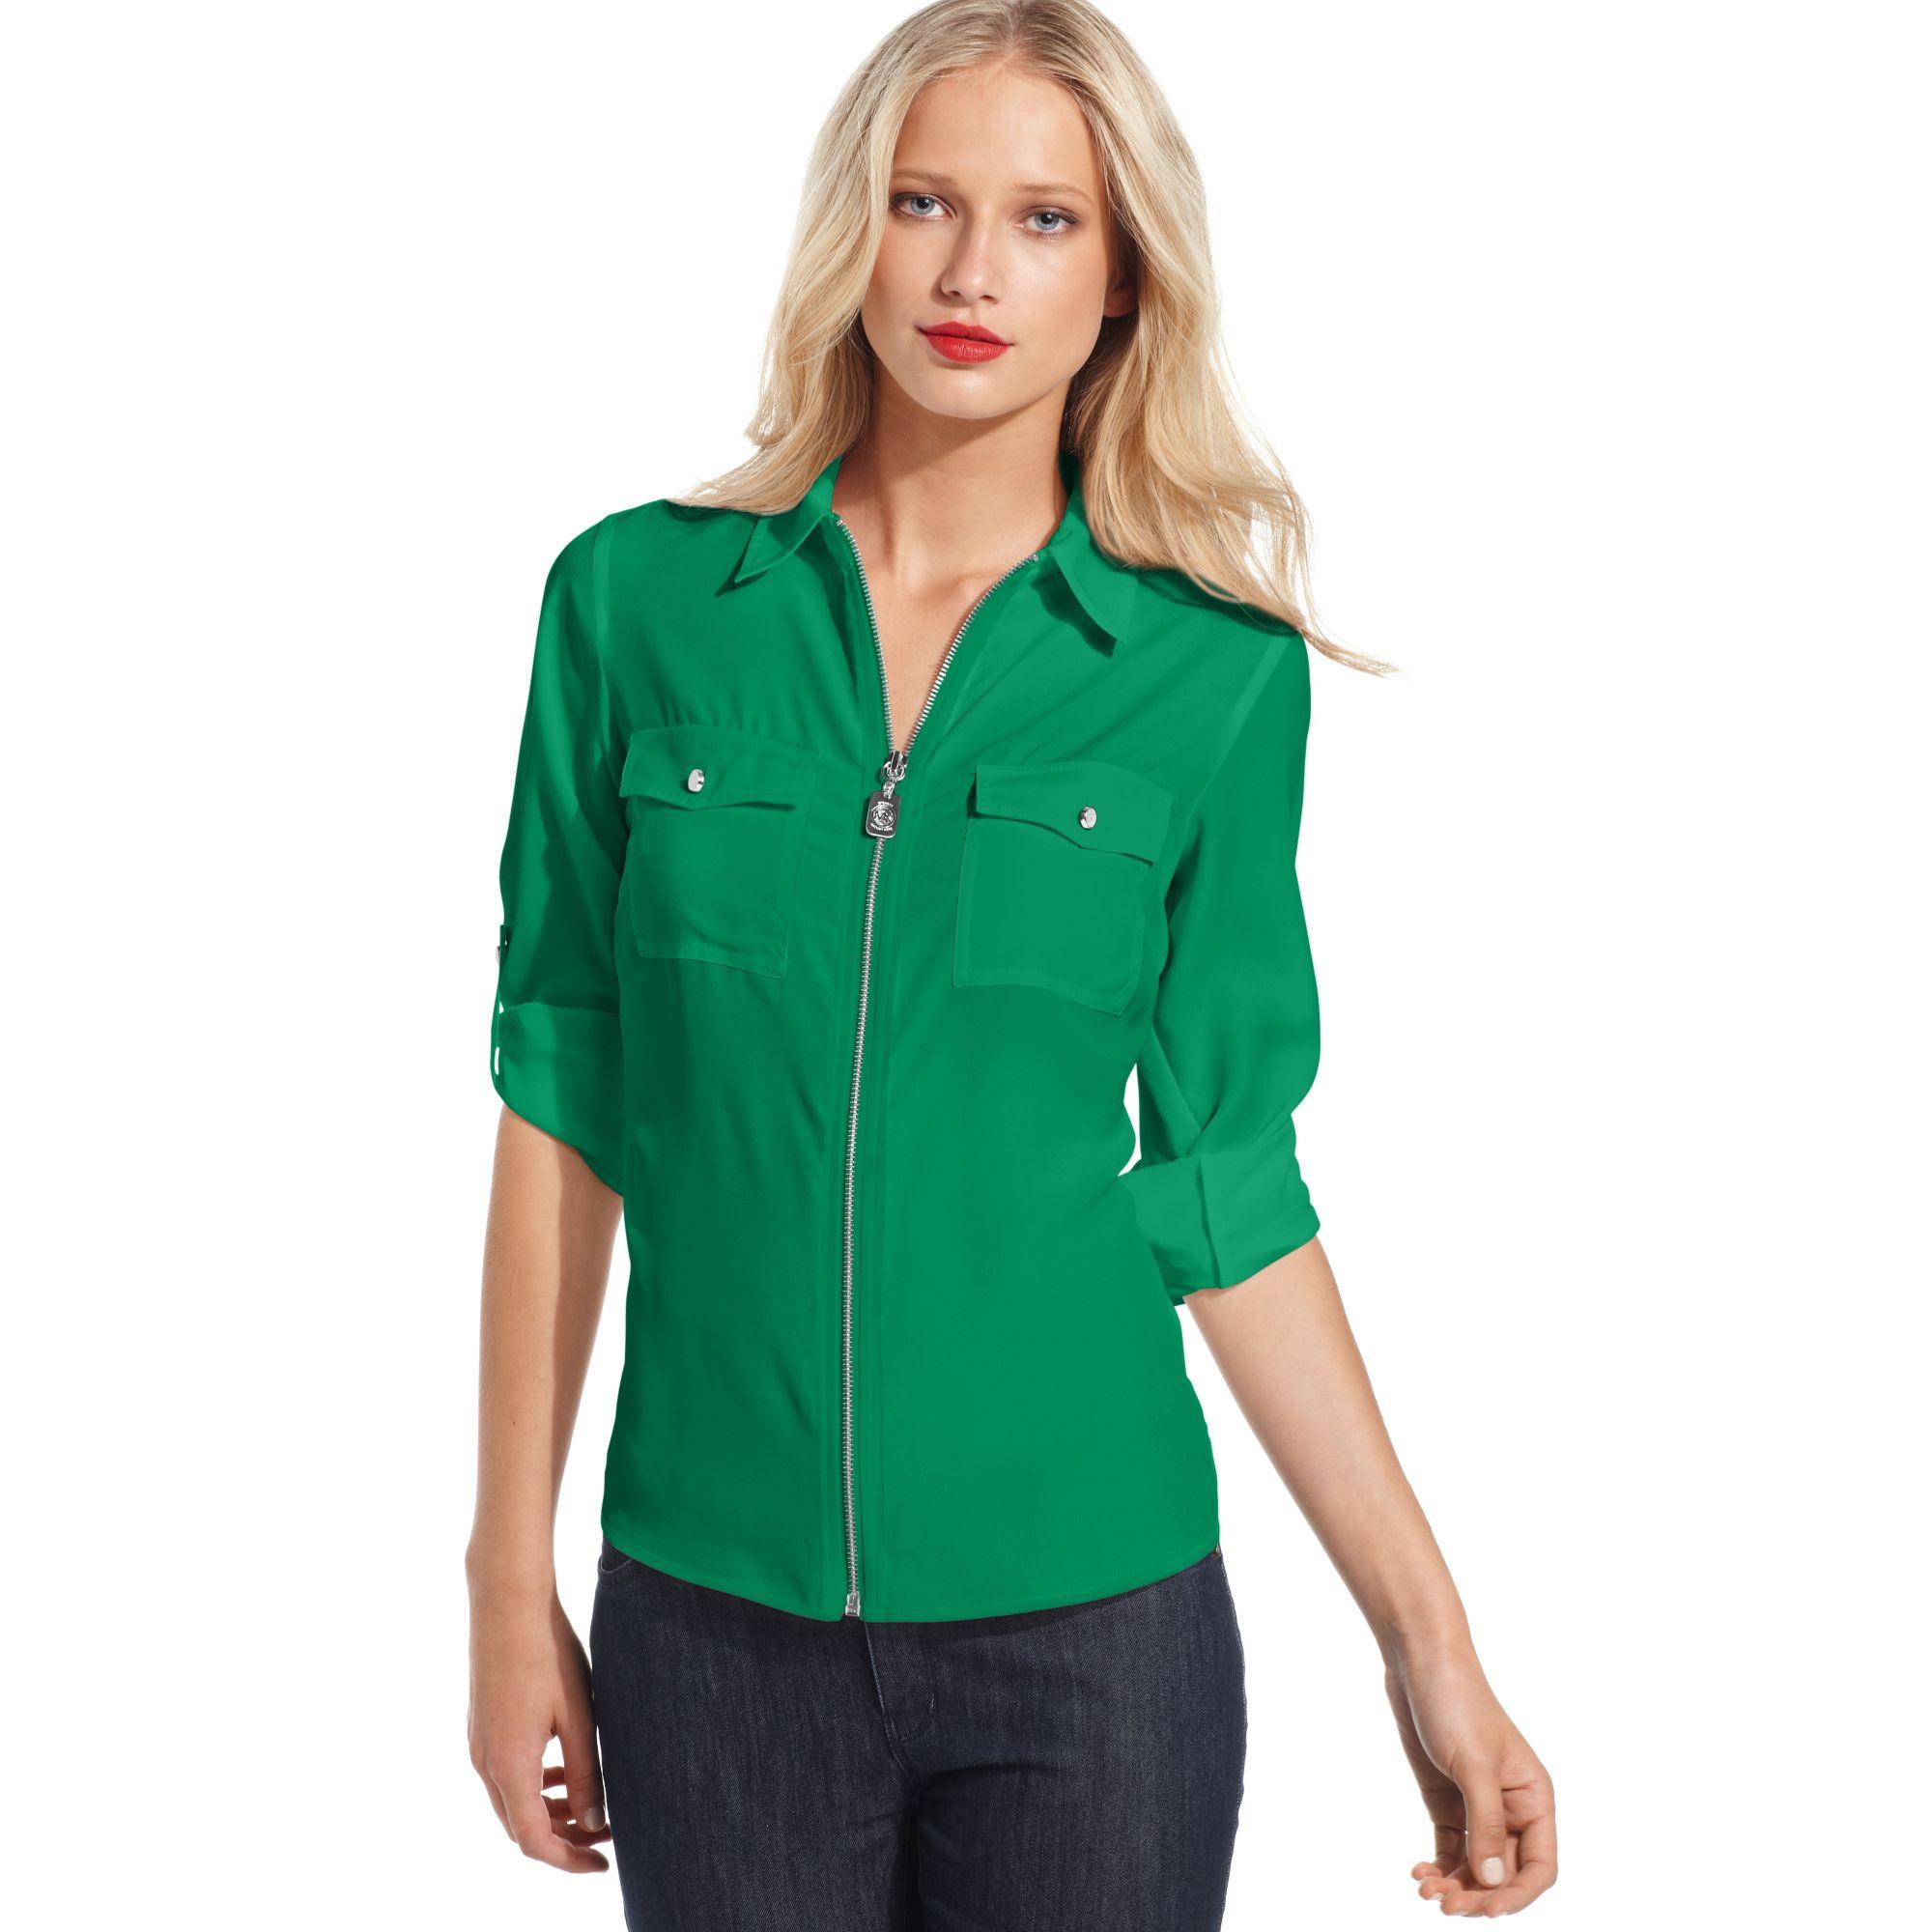 michael kors long sleeve zip front shirt in green spring green lyst. Black Bedroom Furniture Sets. Home Design Ideas